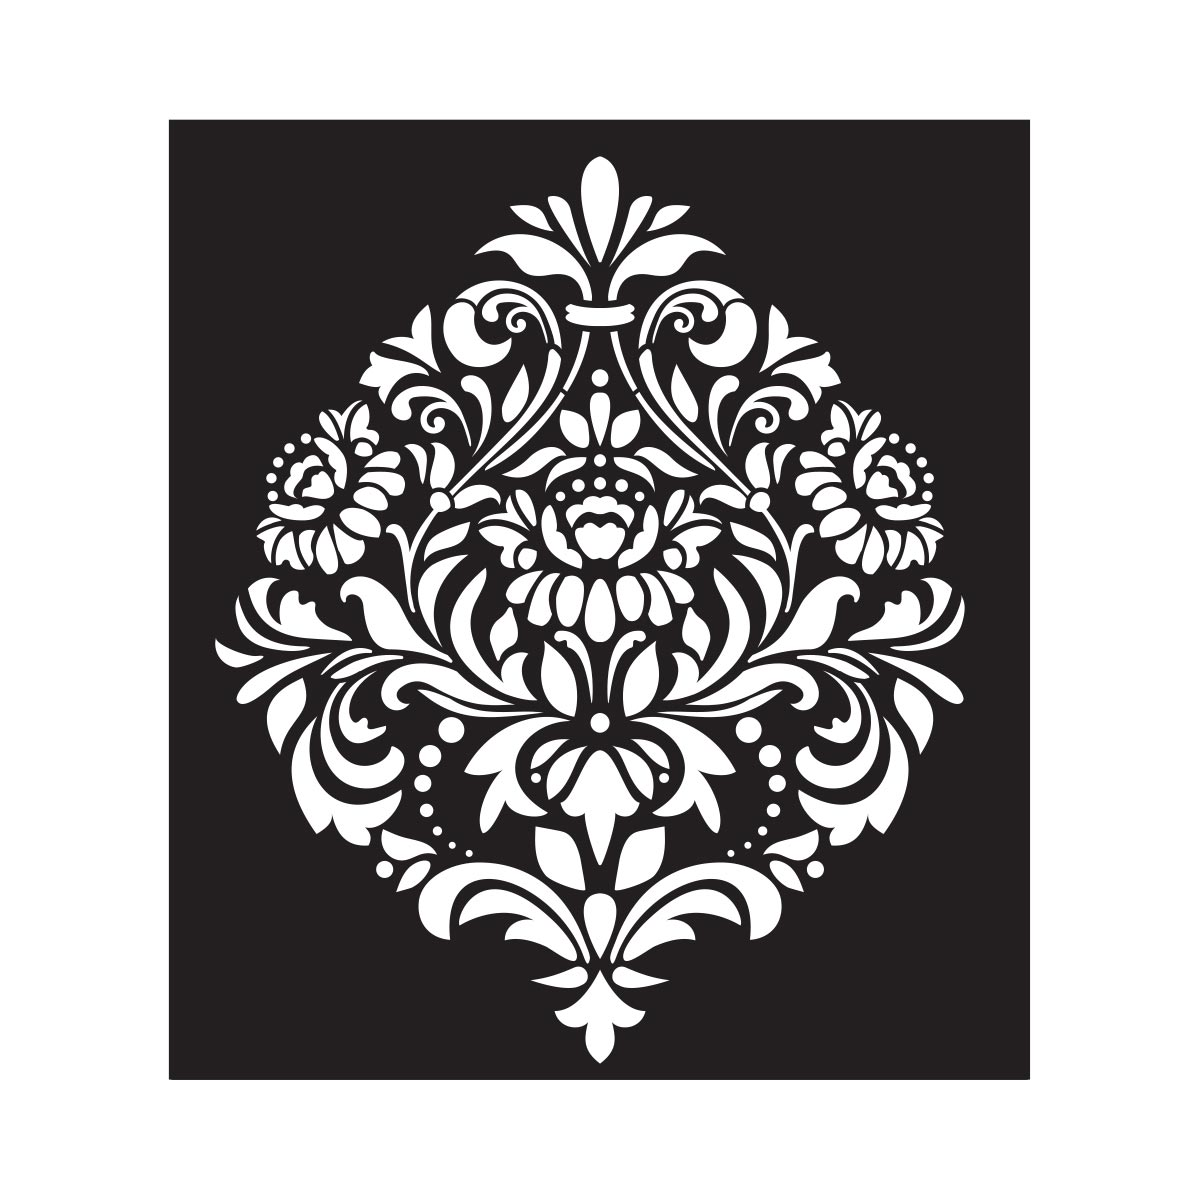 FolkArt ® Painting Stencils - Large - Damask 2